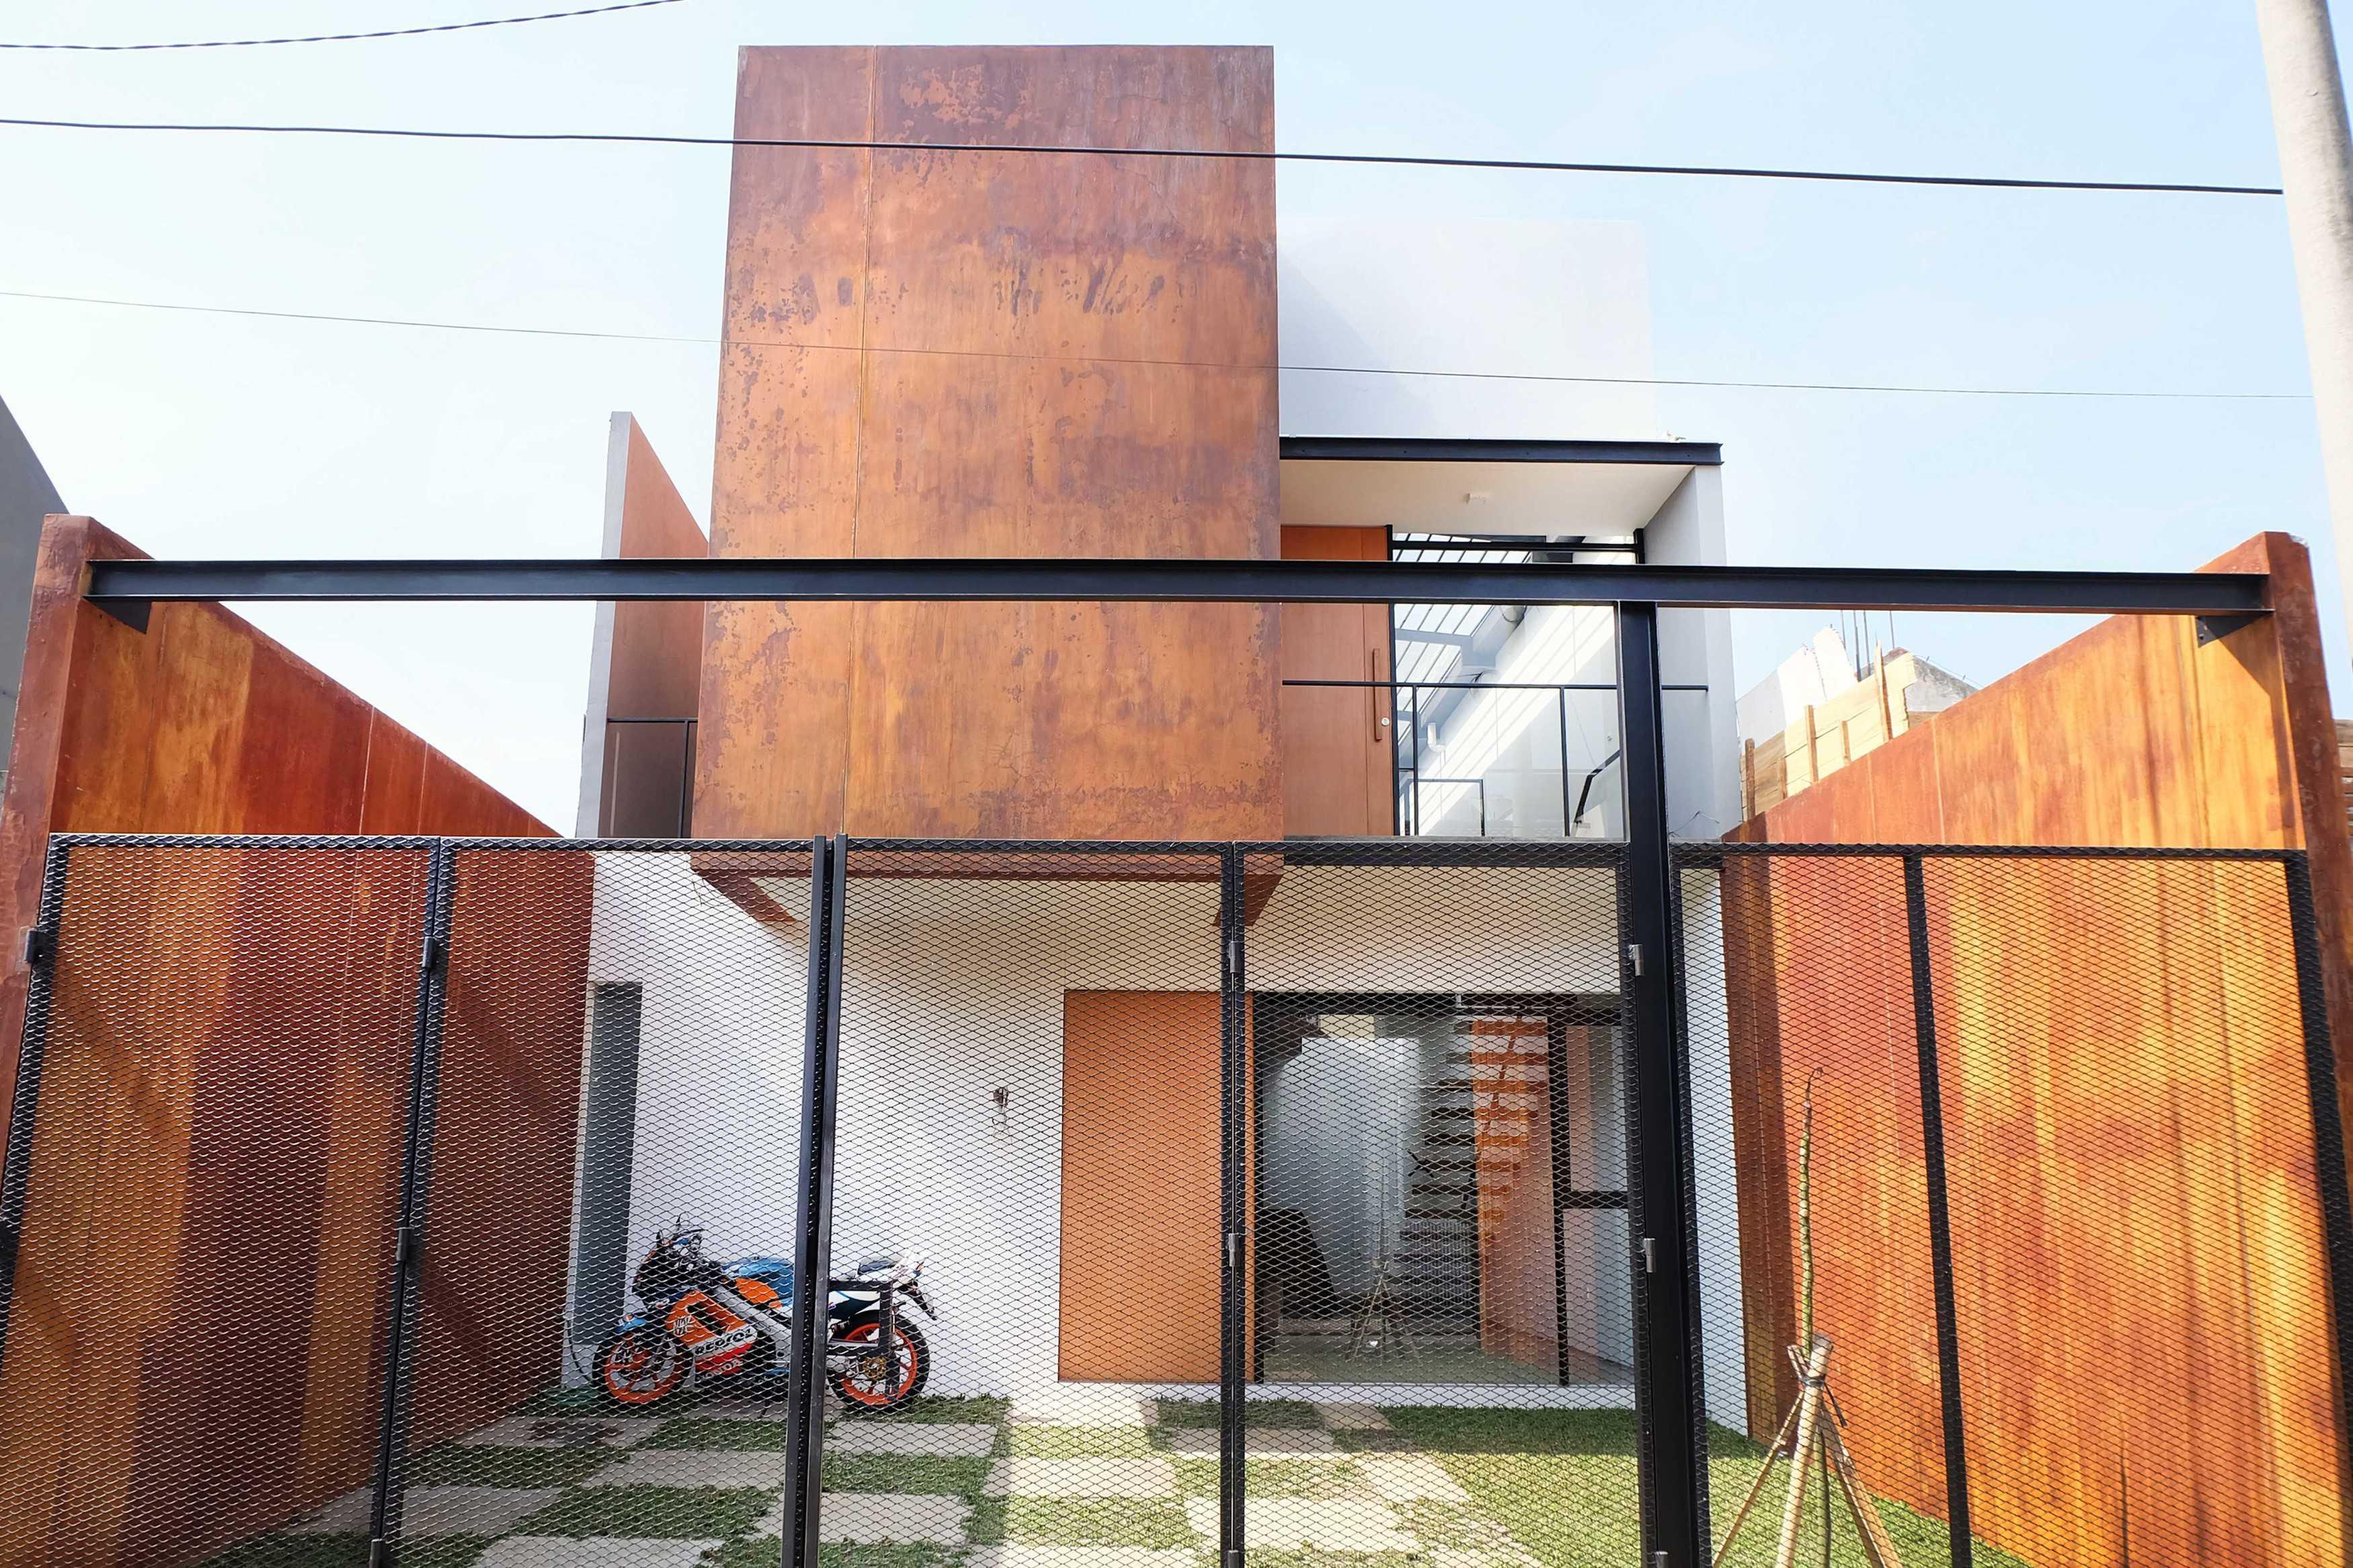 Dica Selaras 105 House Antapani, Kota Bandung, Jawa Barat, Indonesia Antapani, Kota Bandung, Jawa Barat, Indonesia Dica-Selaras-105-House   62323